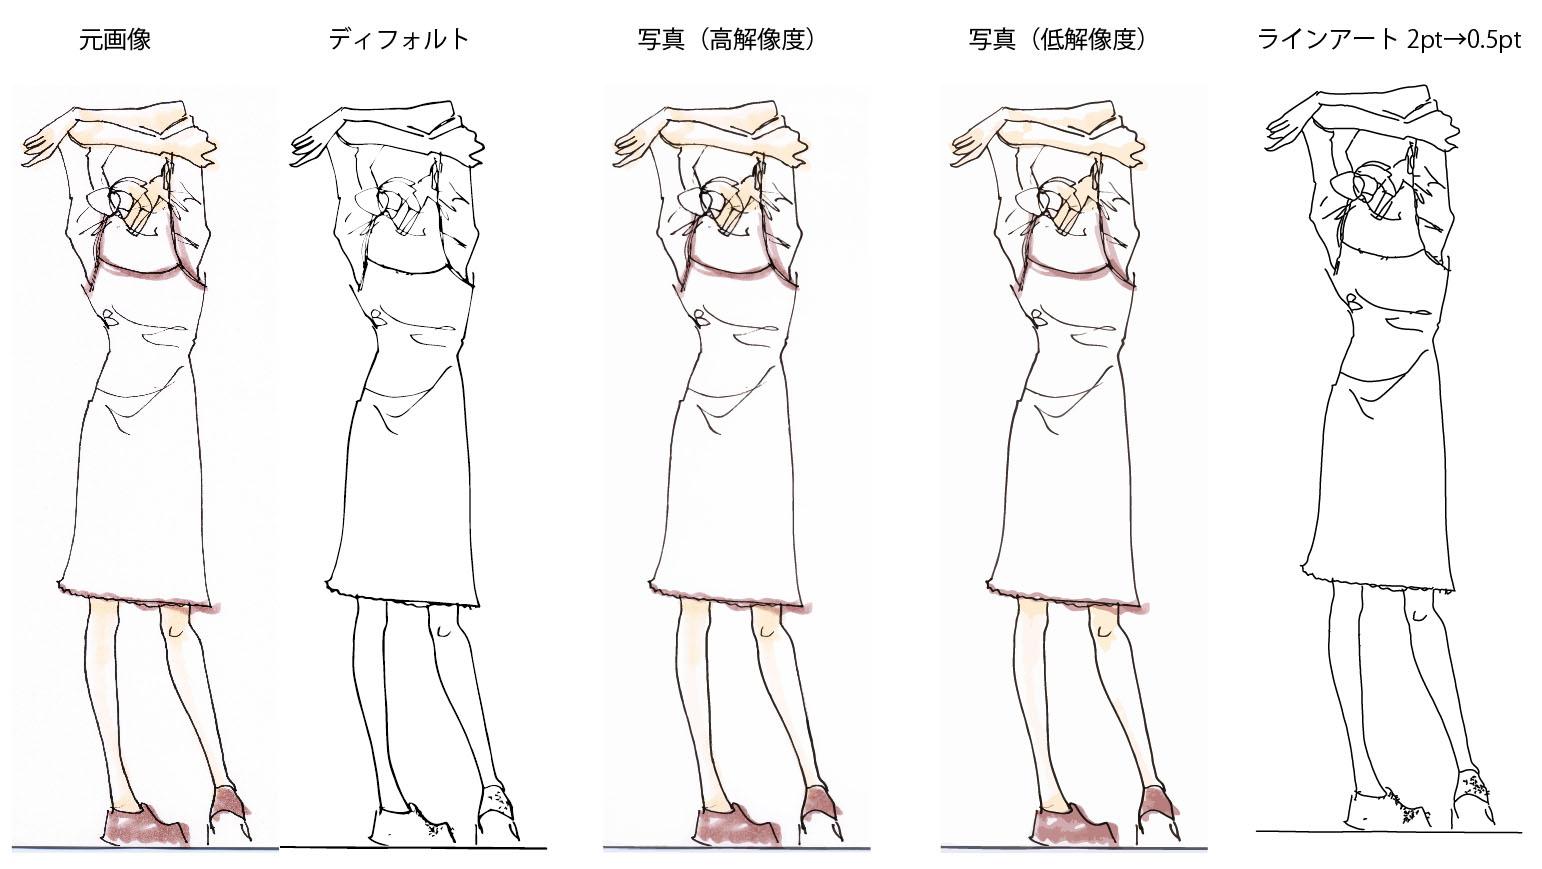 IllustratorCS6 トレース結果